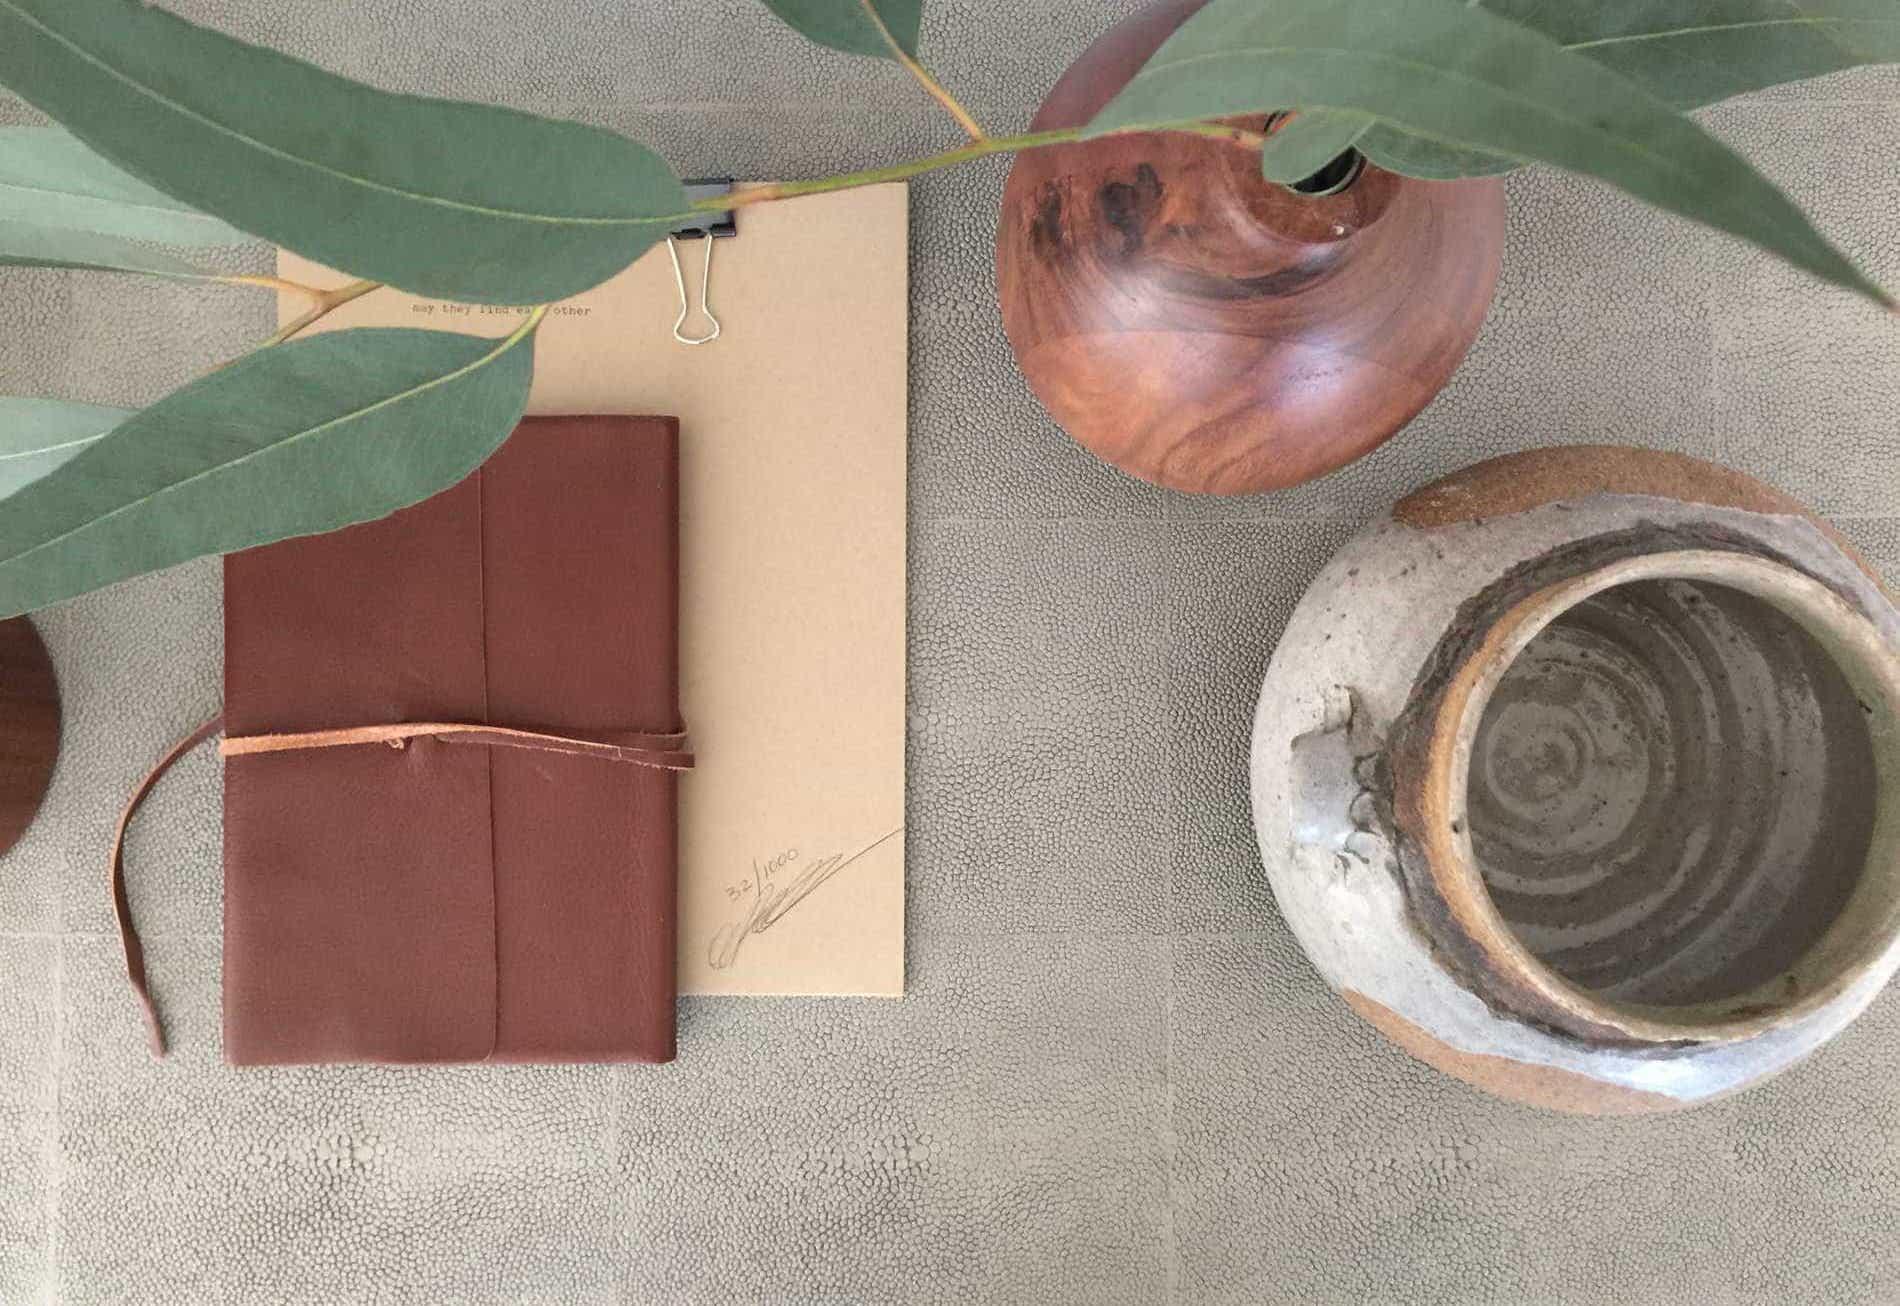 Terra Firma interior designer Krissy Millner talks about what's happening in the world of interior design.